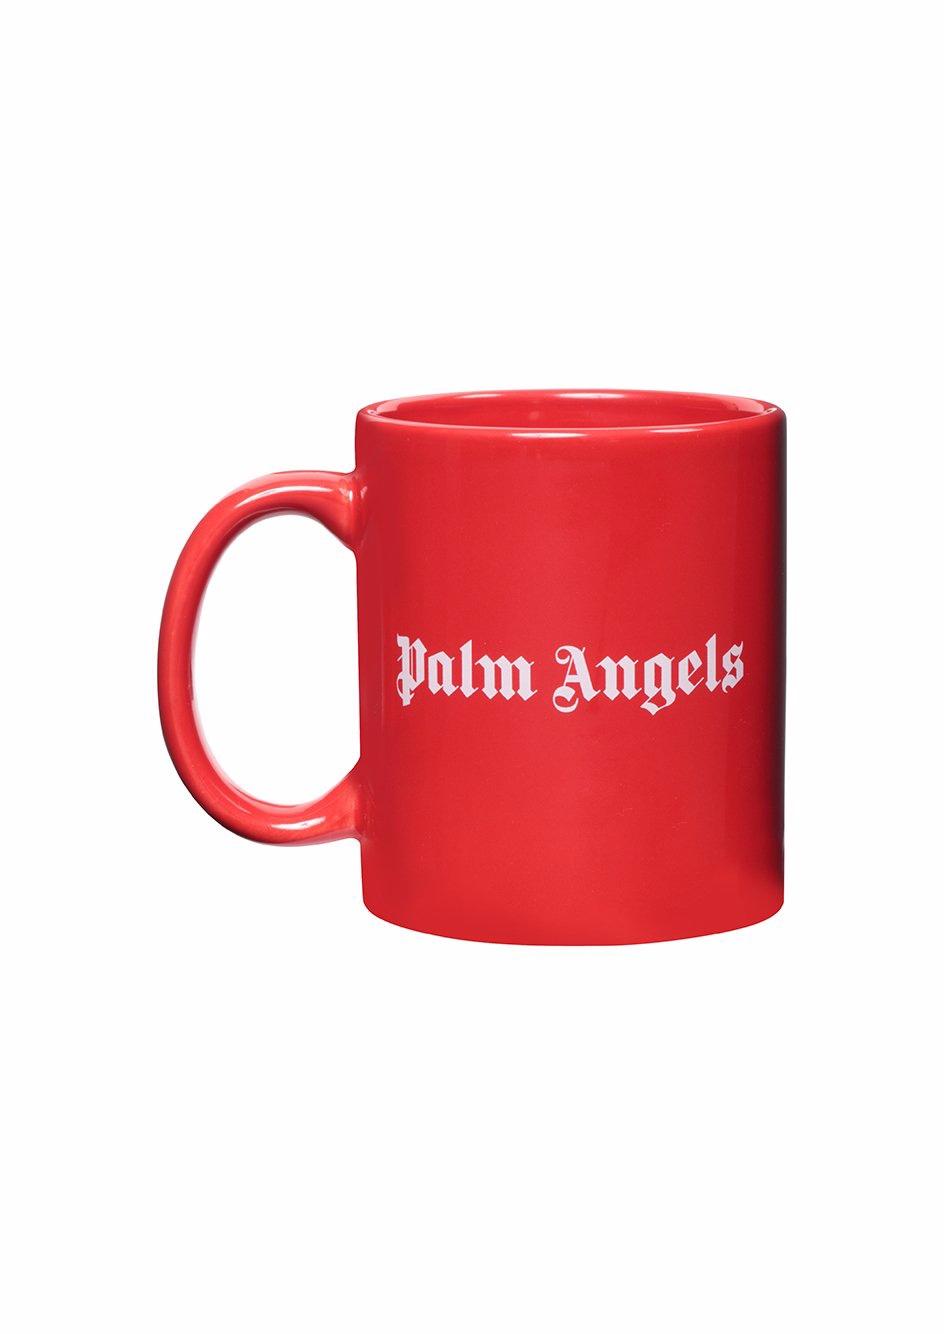 Palm Angels Mug